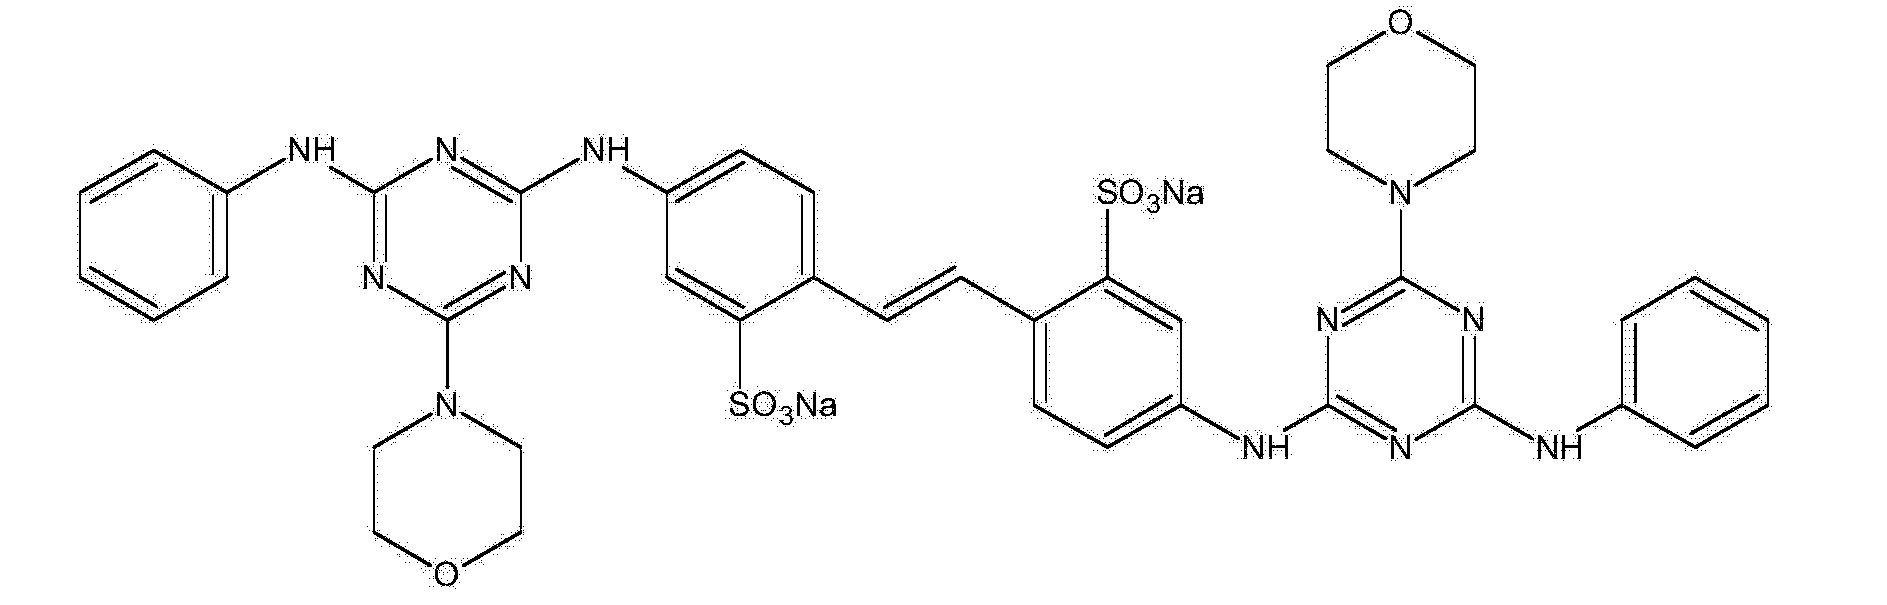 Figure CN104302753AD00322